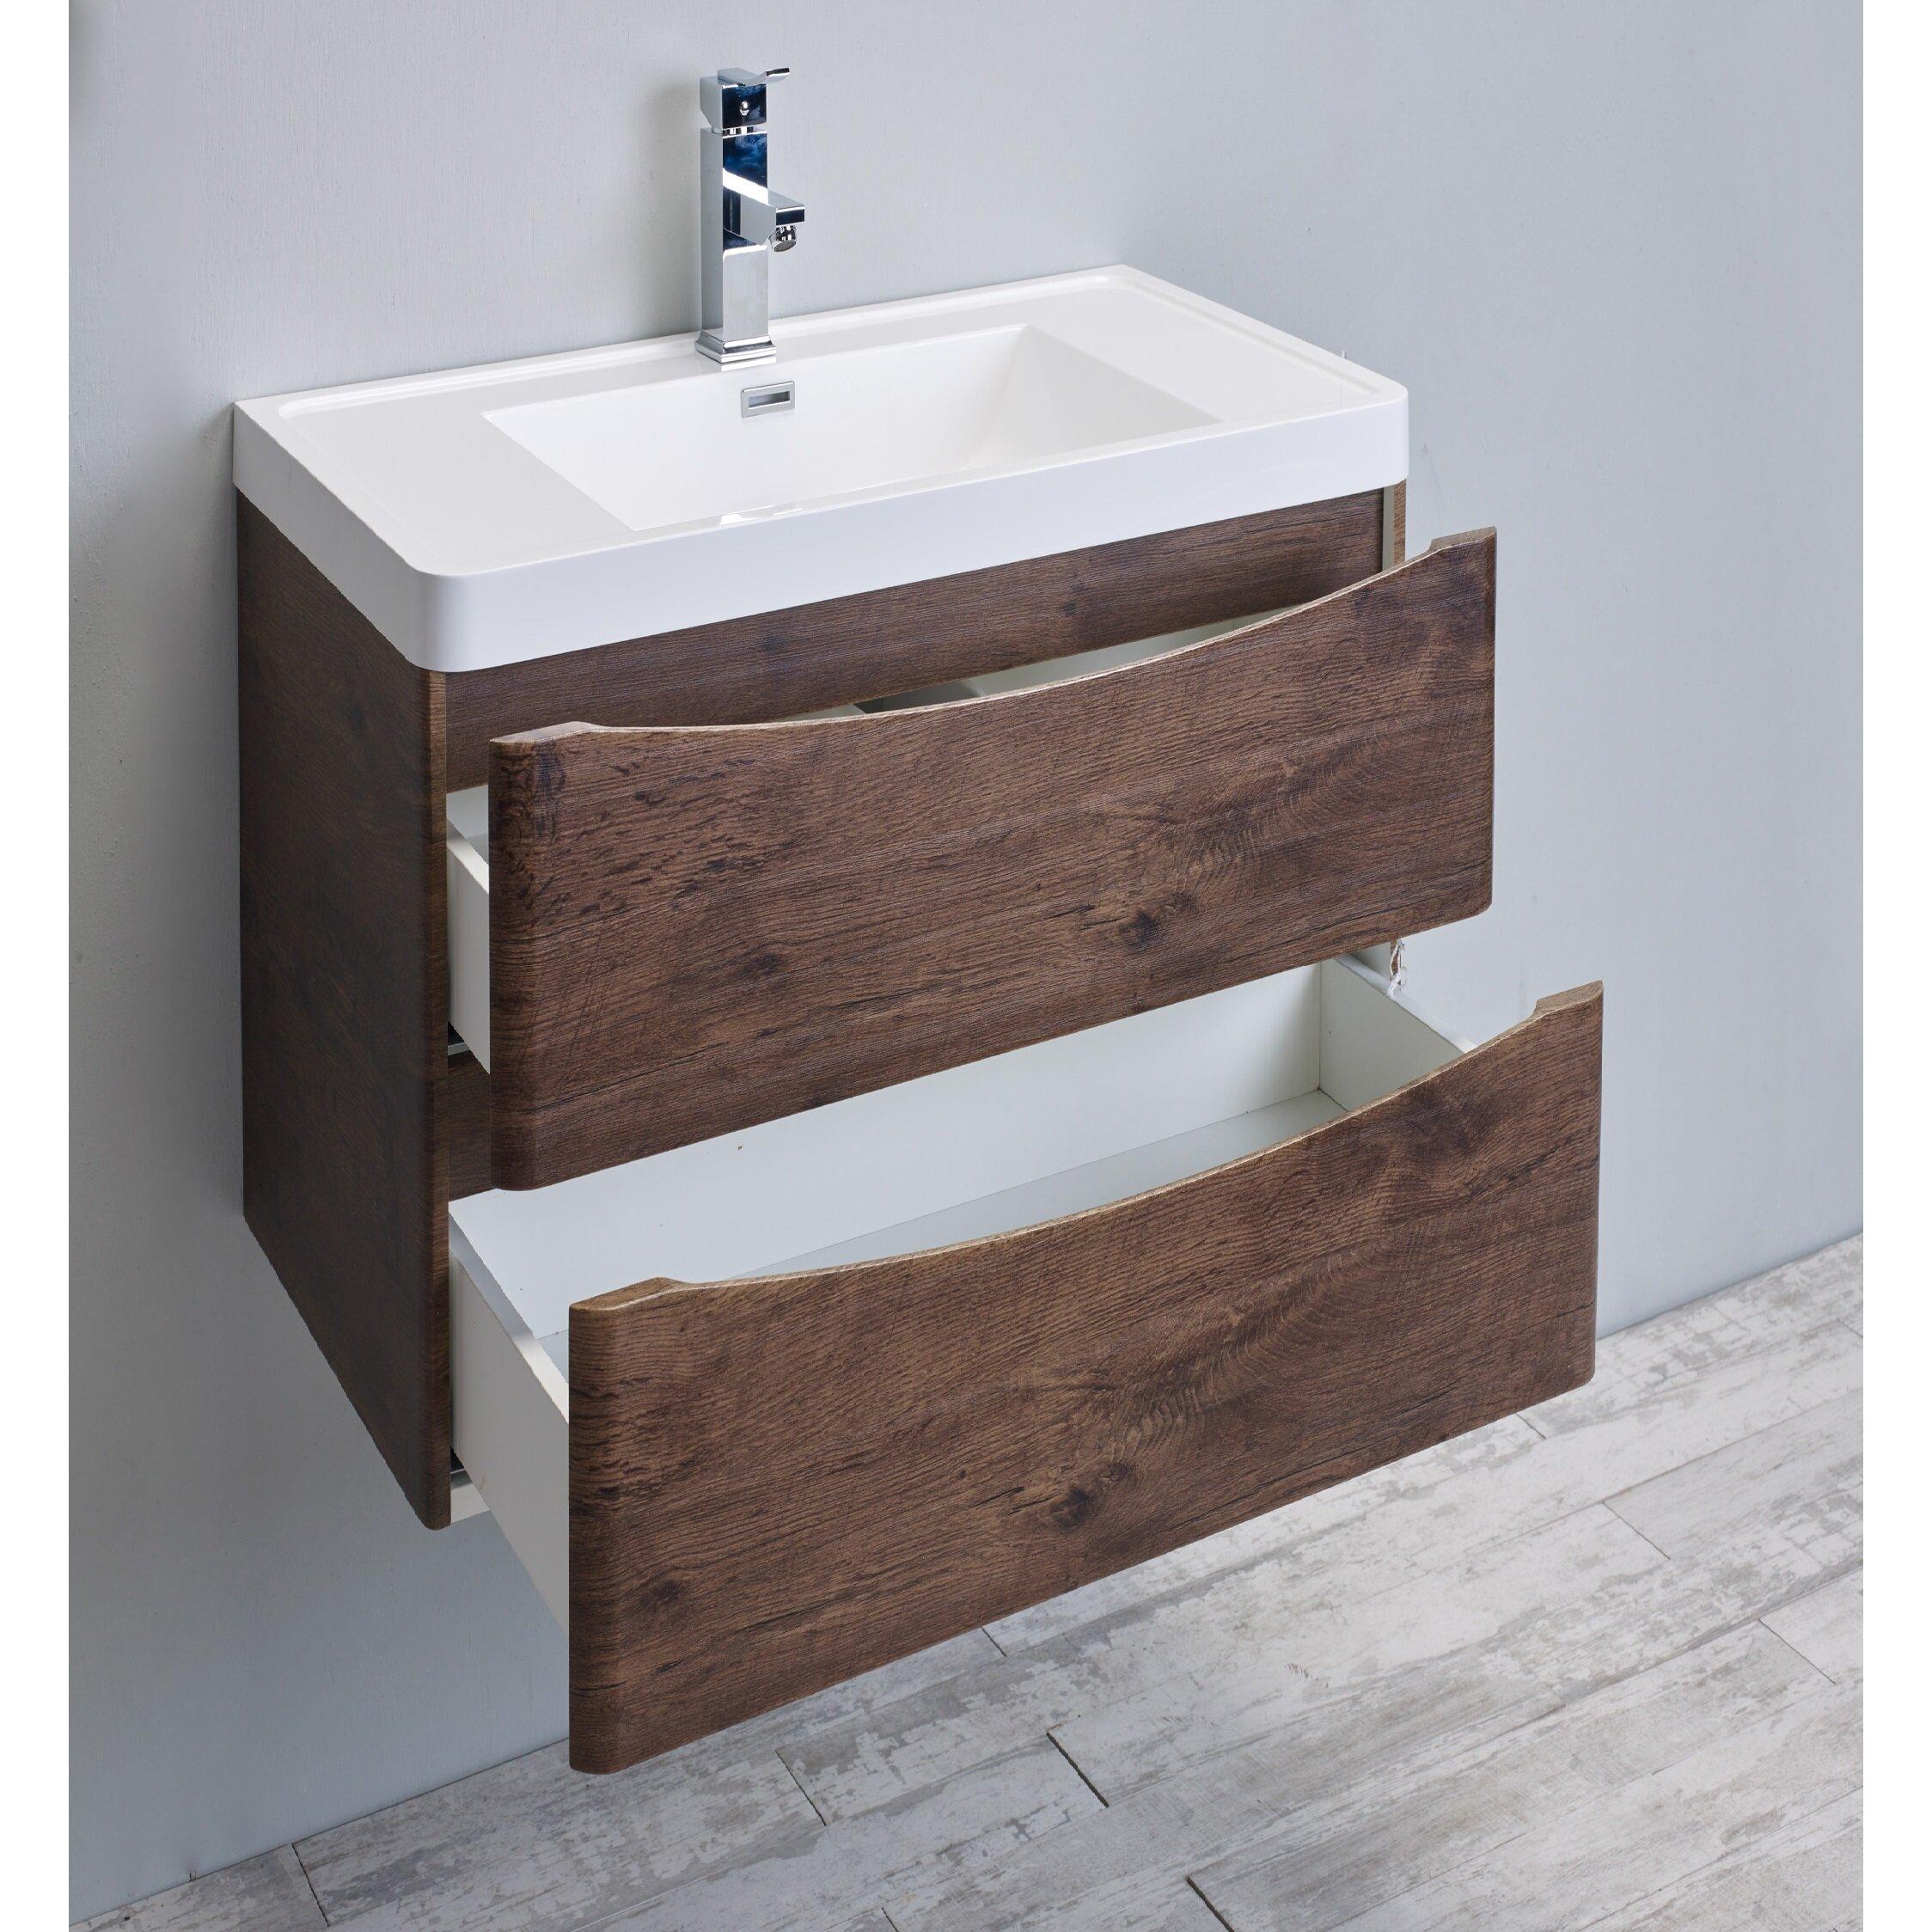 Eviva Smile reg  30 quot  Single Bathroom Vanity Set. Eviva Smile  30  Single Bathroom Vanity Set   Reviews   Wayfair